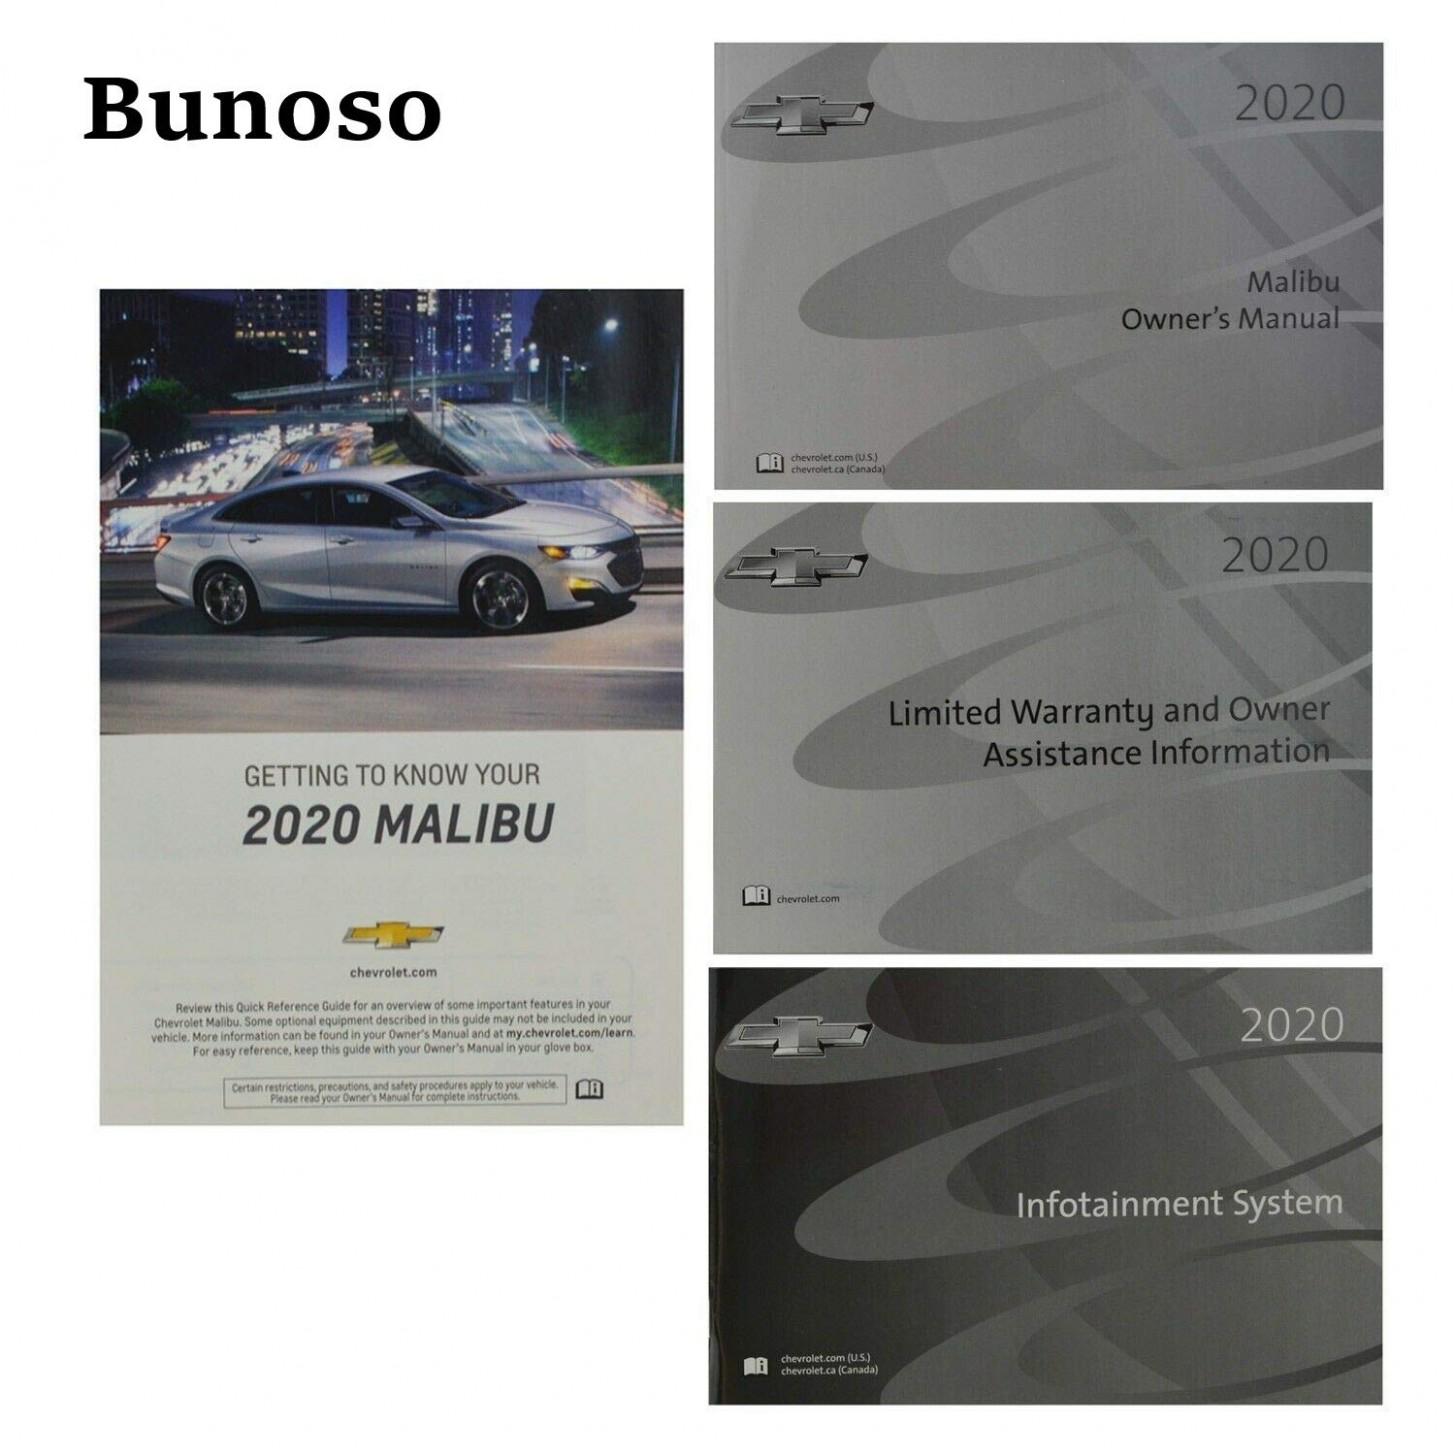 5 Chevrolet Chevy Malibu Owners Manual 5: Chevrolet - 2020 chevrolet owners manual